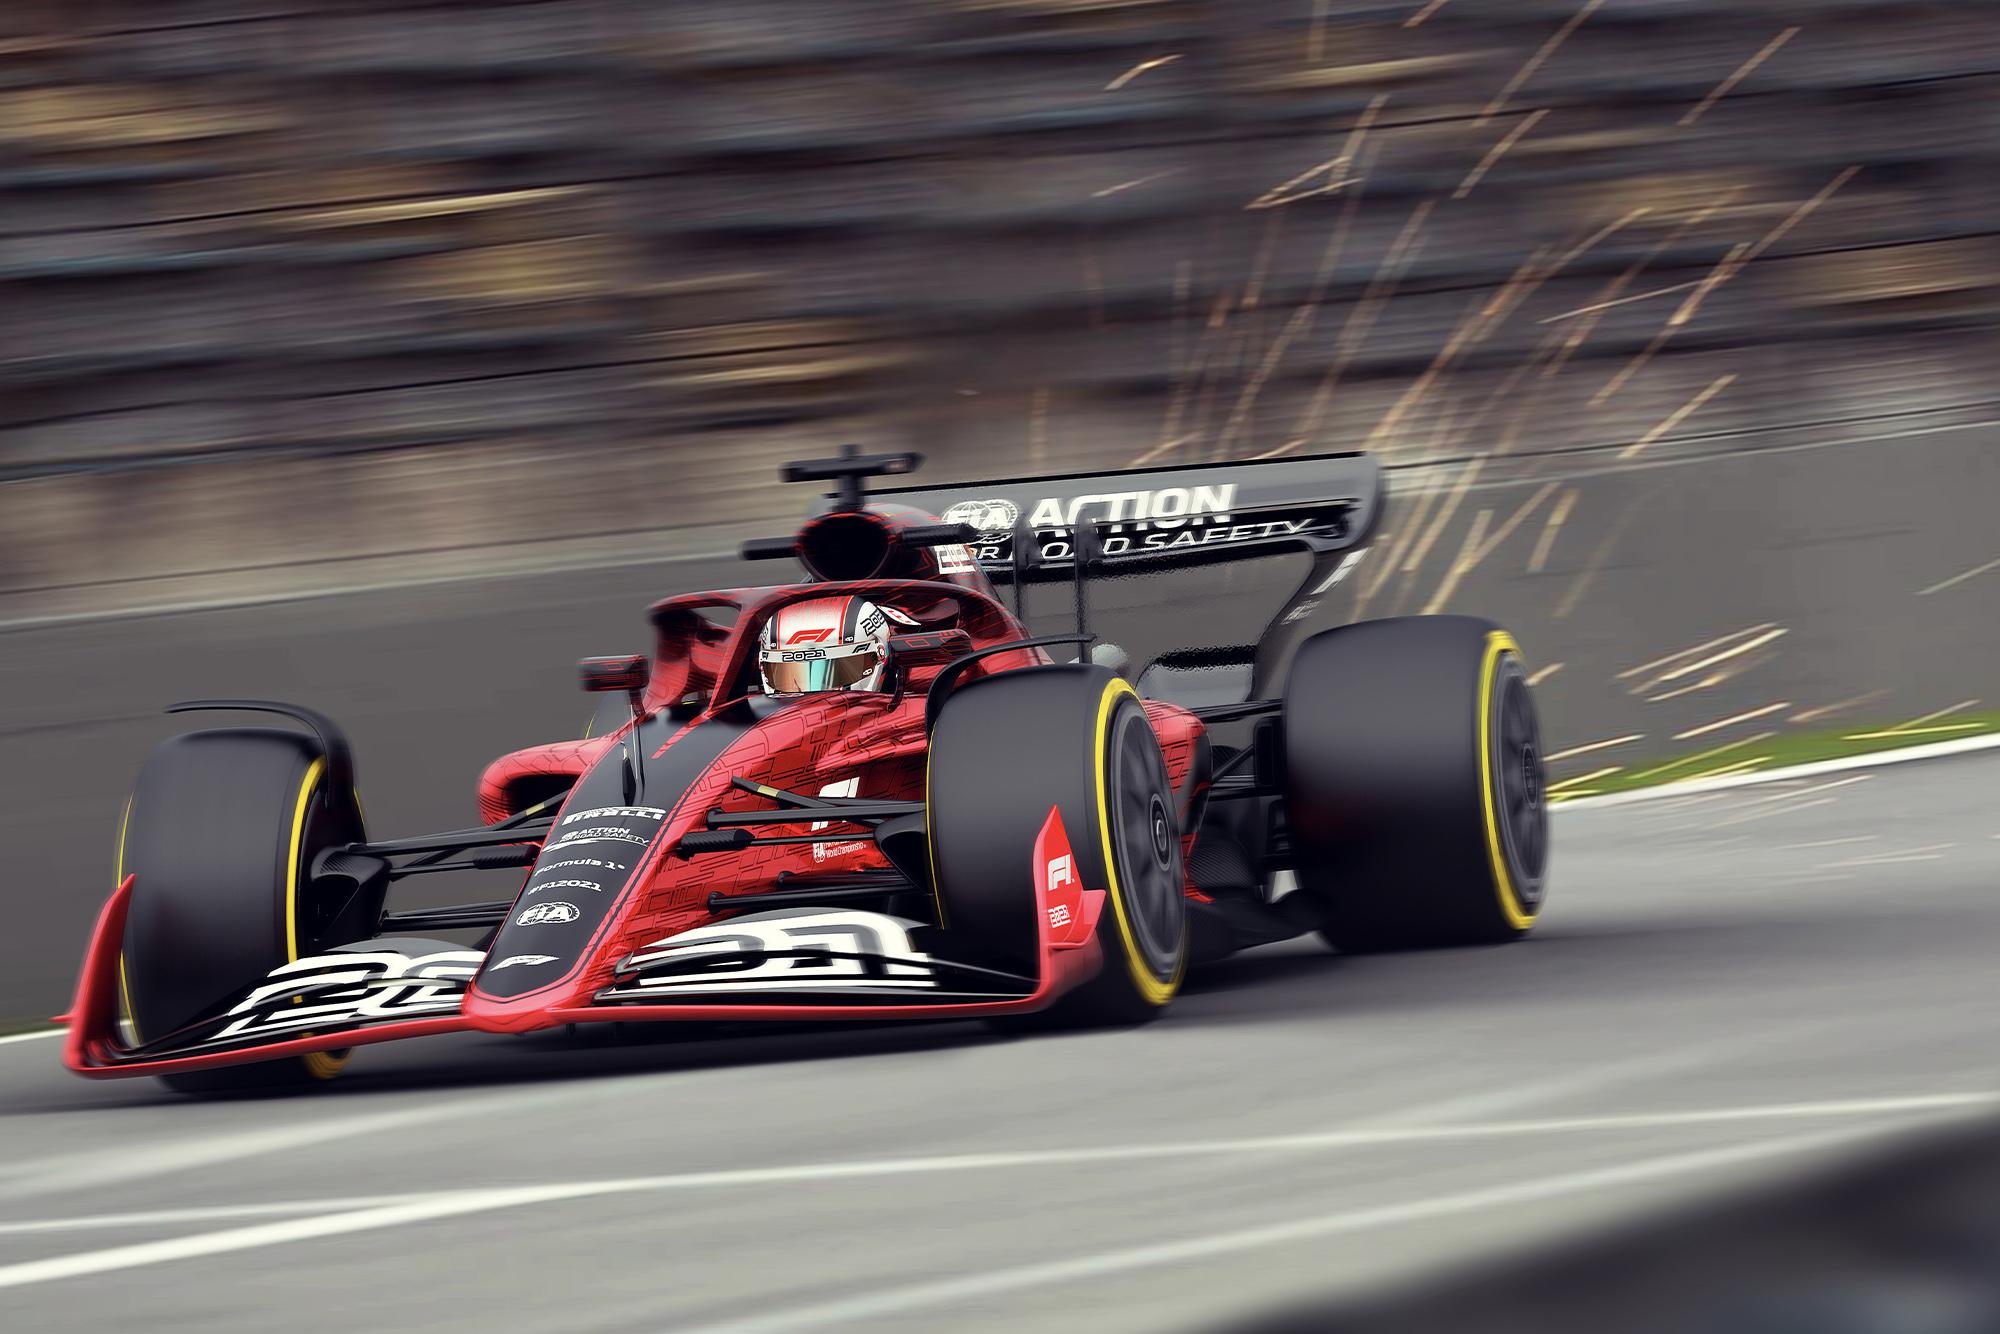 2021 F1 sparks